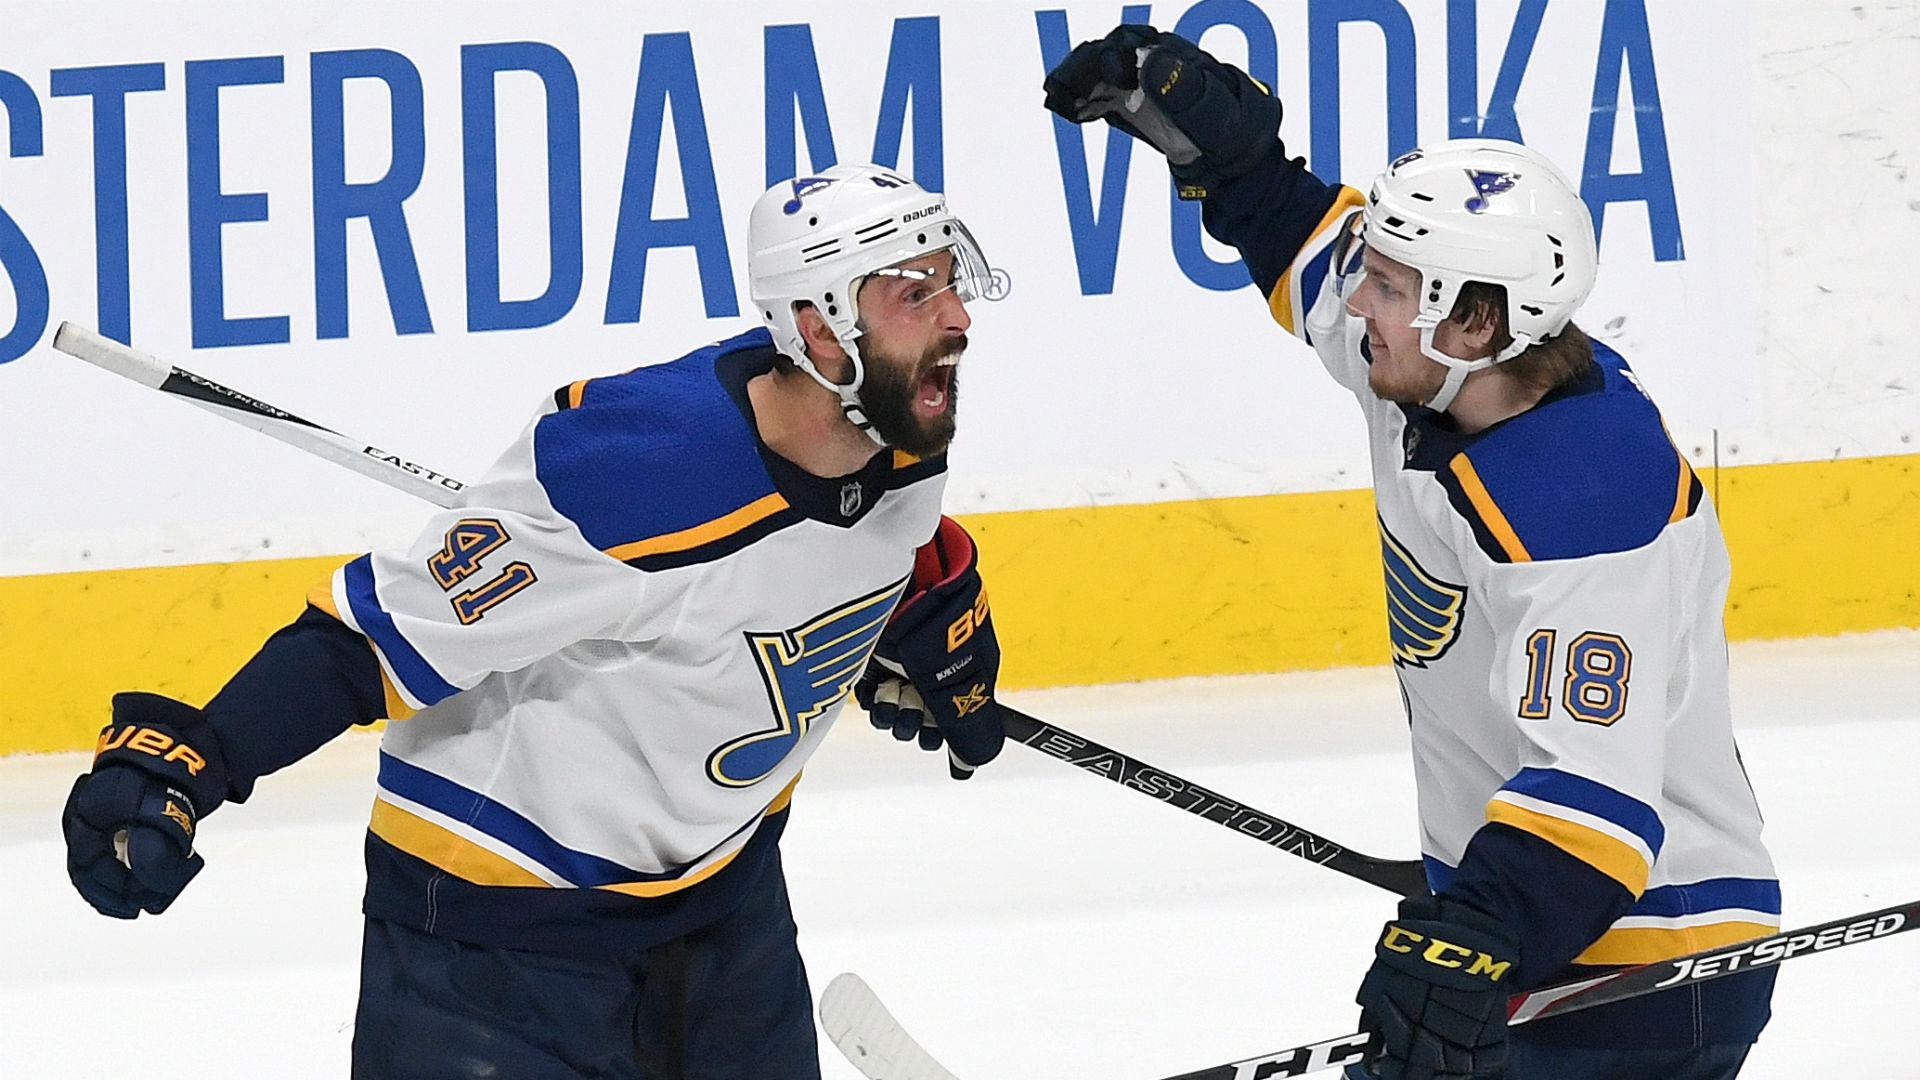 NHL playoffs 2019: Beau Bennett, Robert Bortuzzo peek into future, call Blues defenseman's game-winner